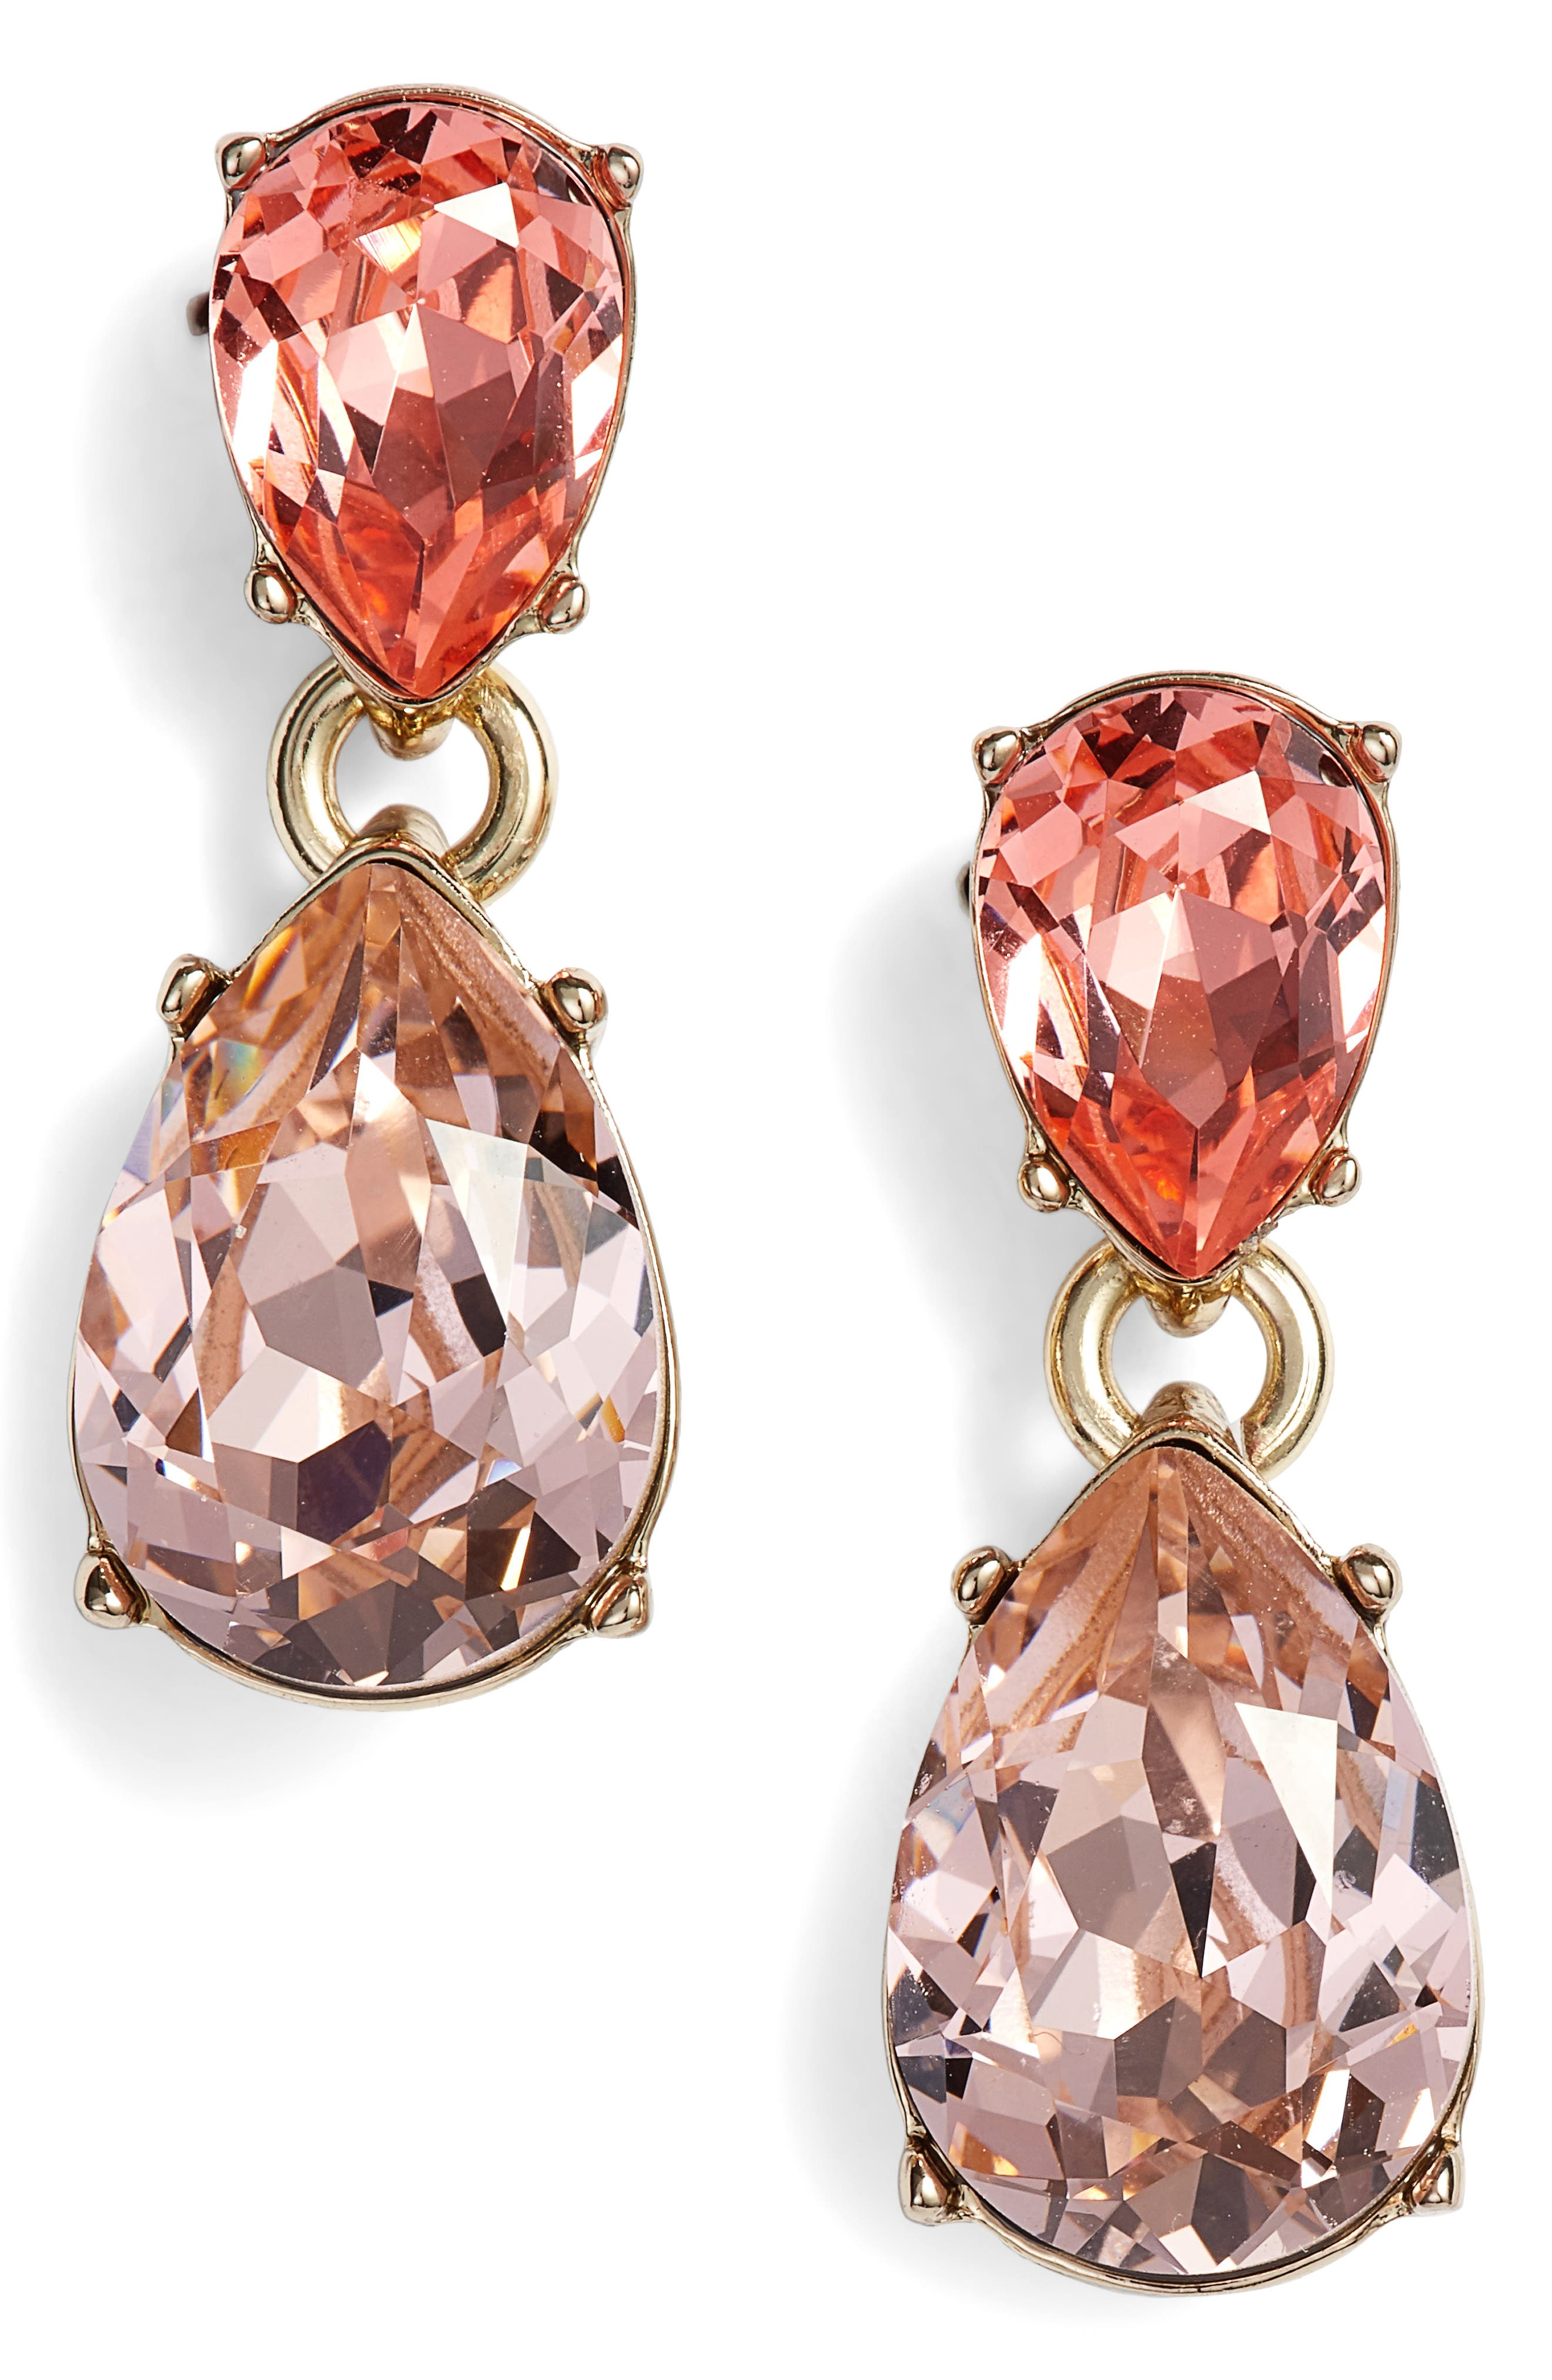 Double Pear Crystal Earrings,                         Main,                         color, Gold/ Peach Multi